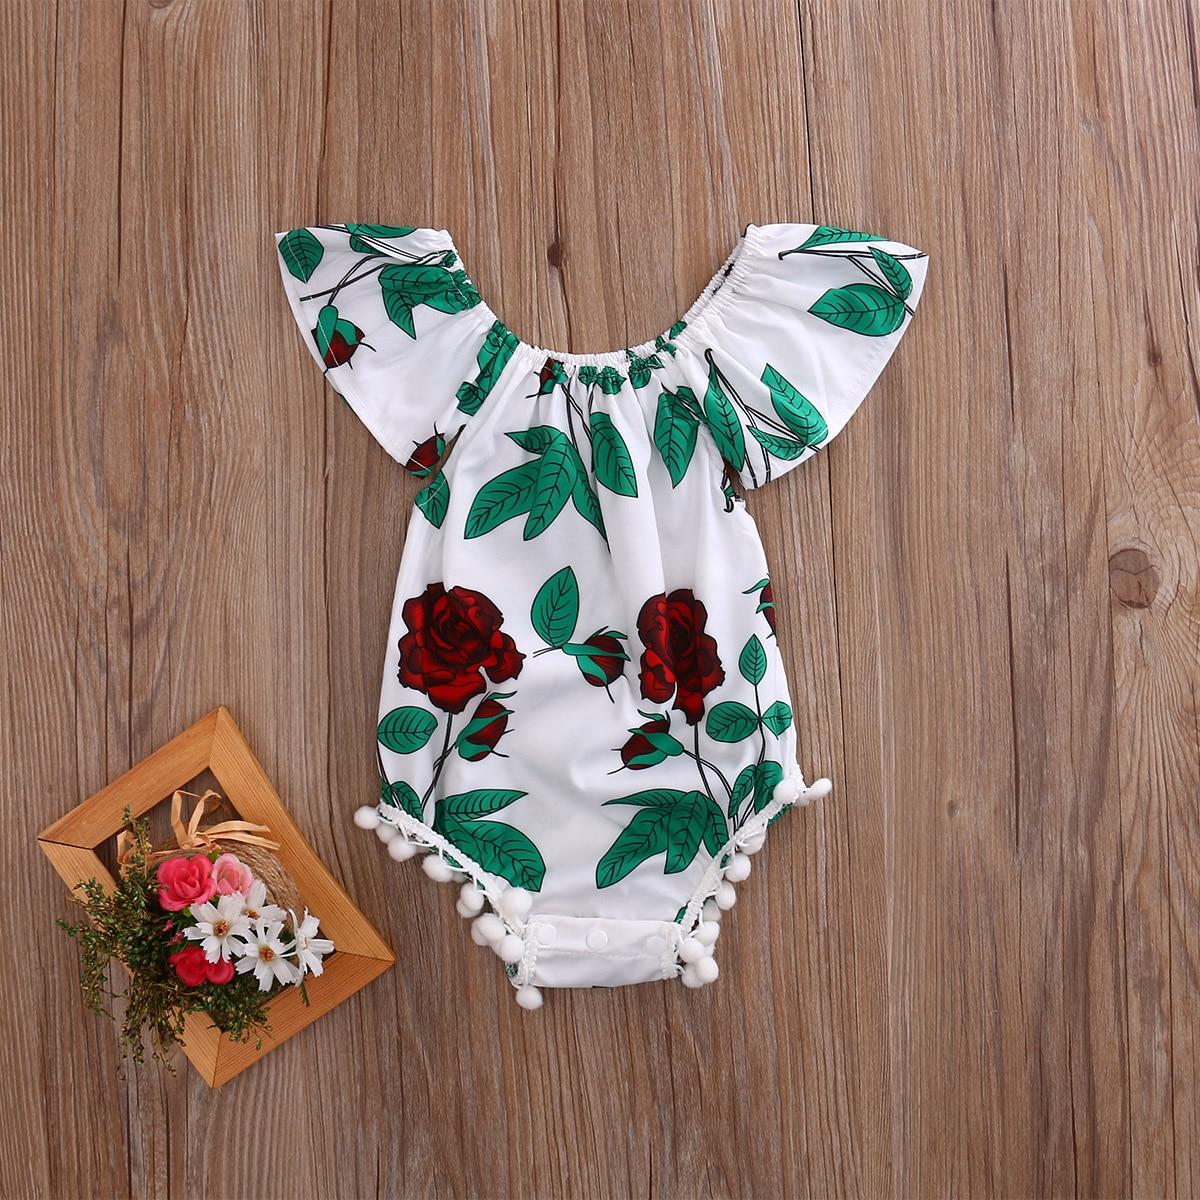 New Arrive Cute Summer Kids Newborn Infant Baby Girl Cotton Ruffle Romper Floral Jumpsuit Outfit Sunsuit Clothes